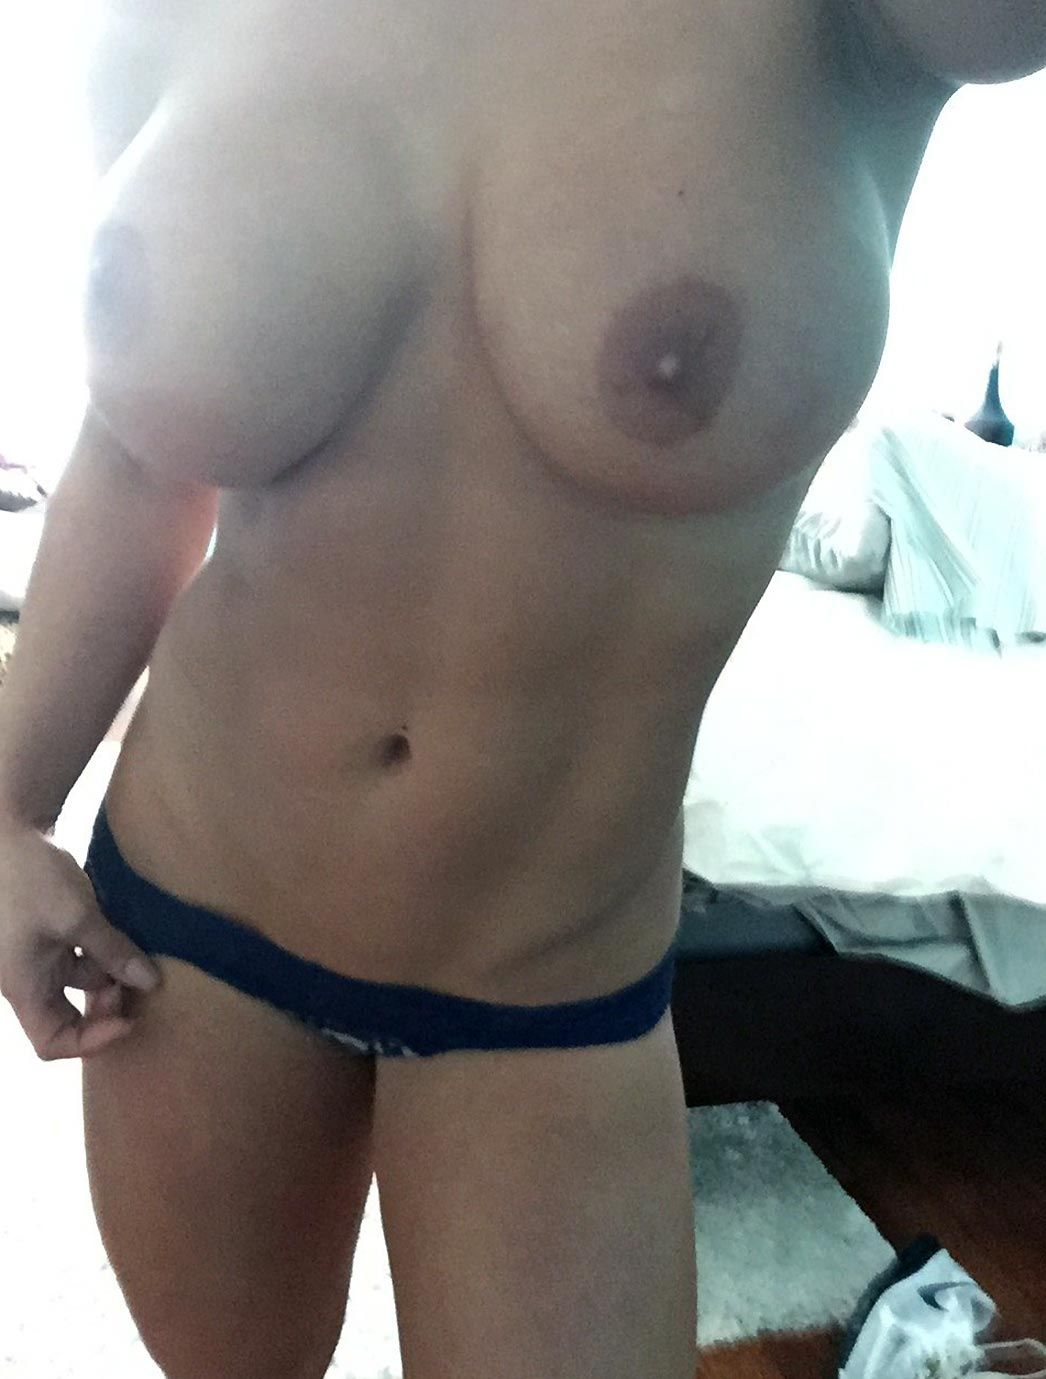 Celeste Bonin Nude Leaked The Fappening & Sexy 0198